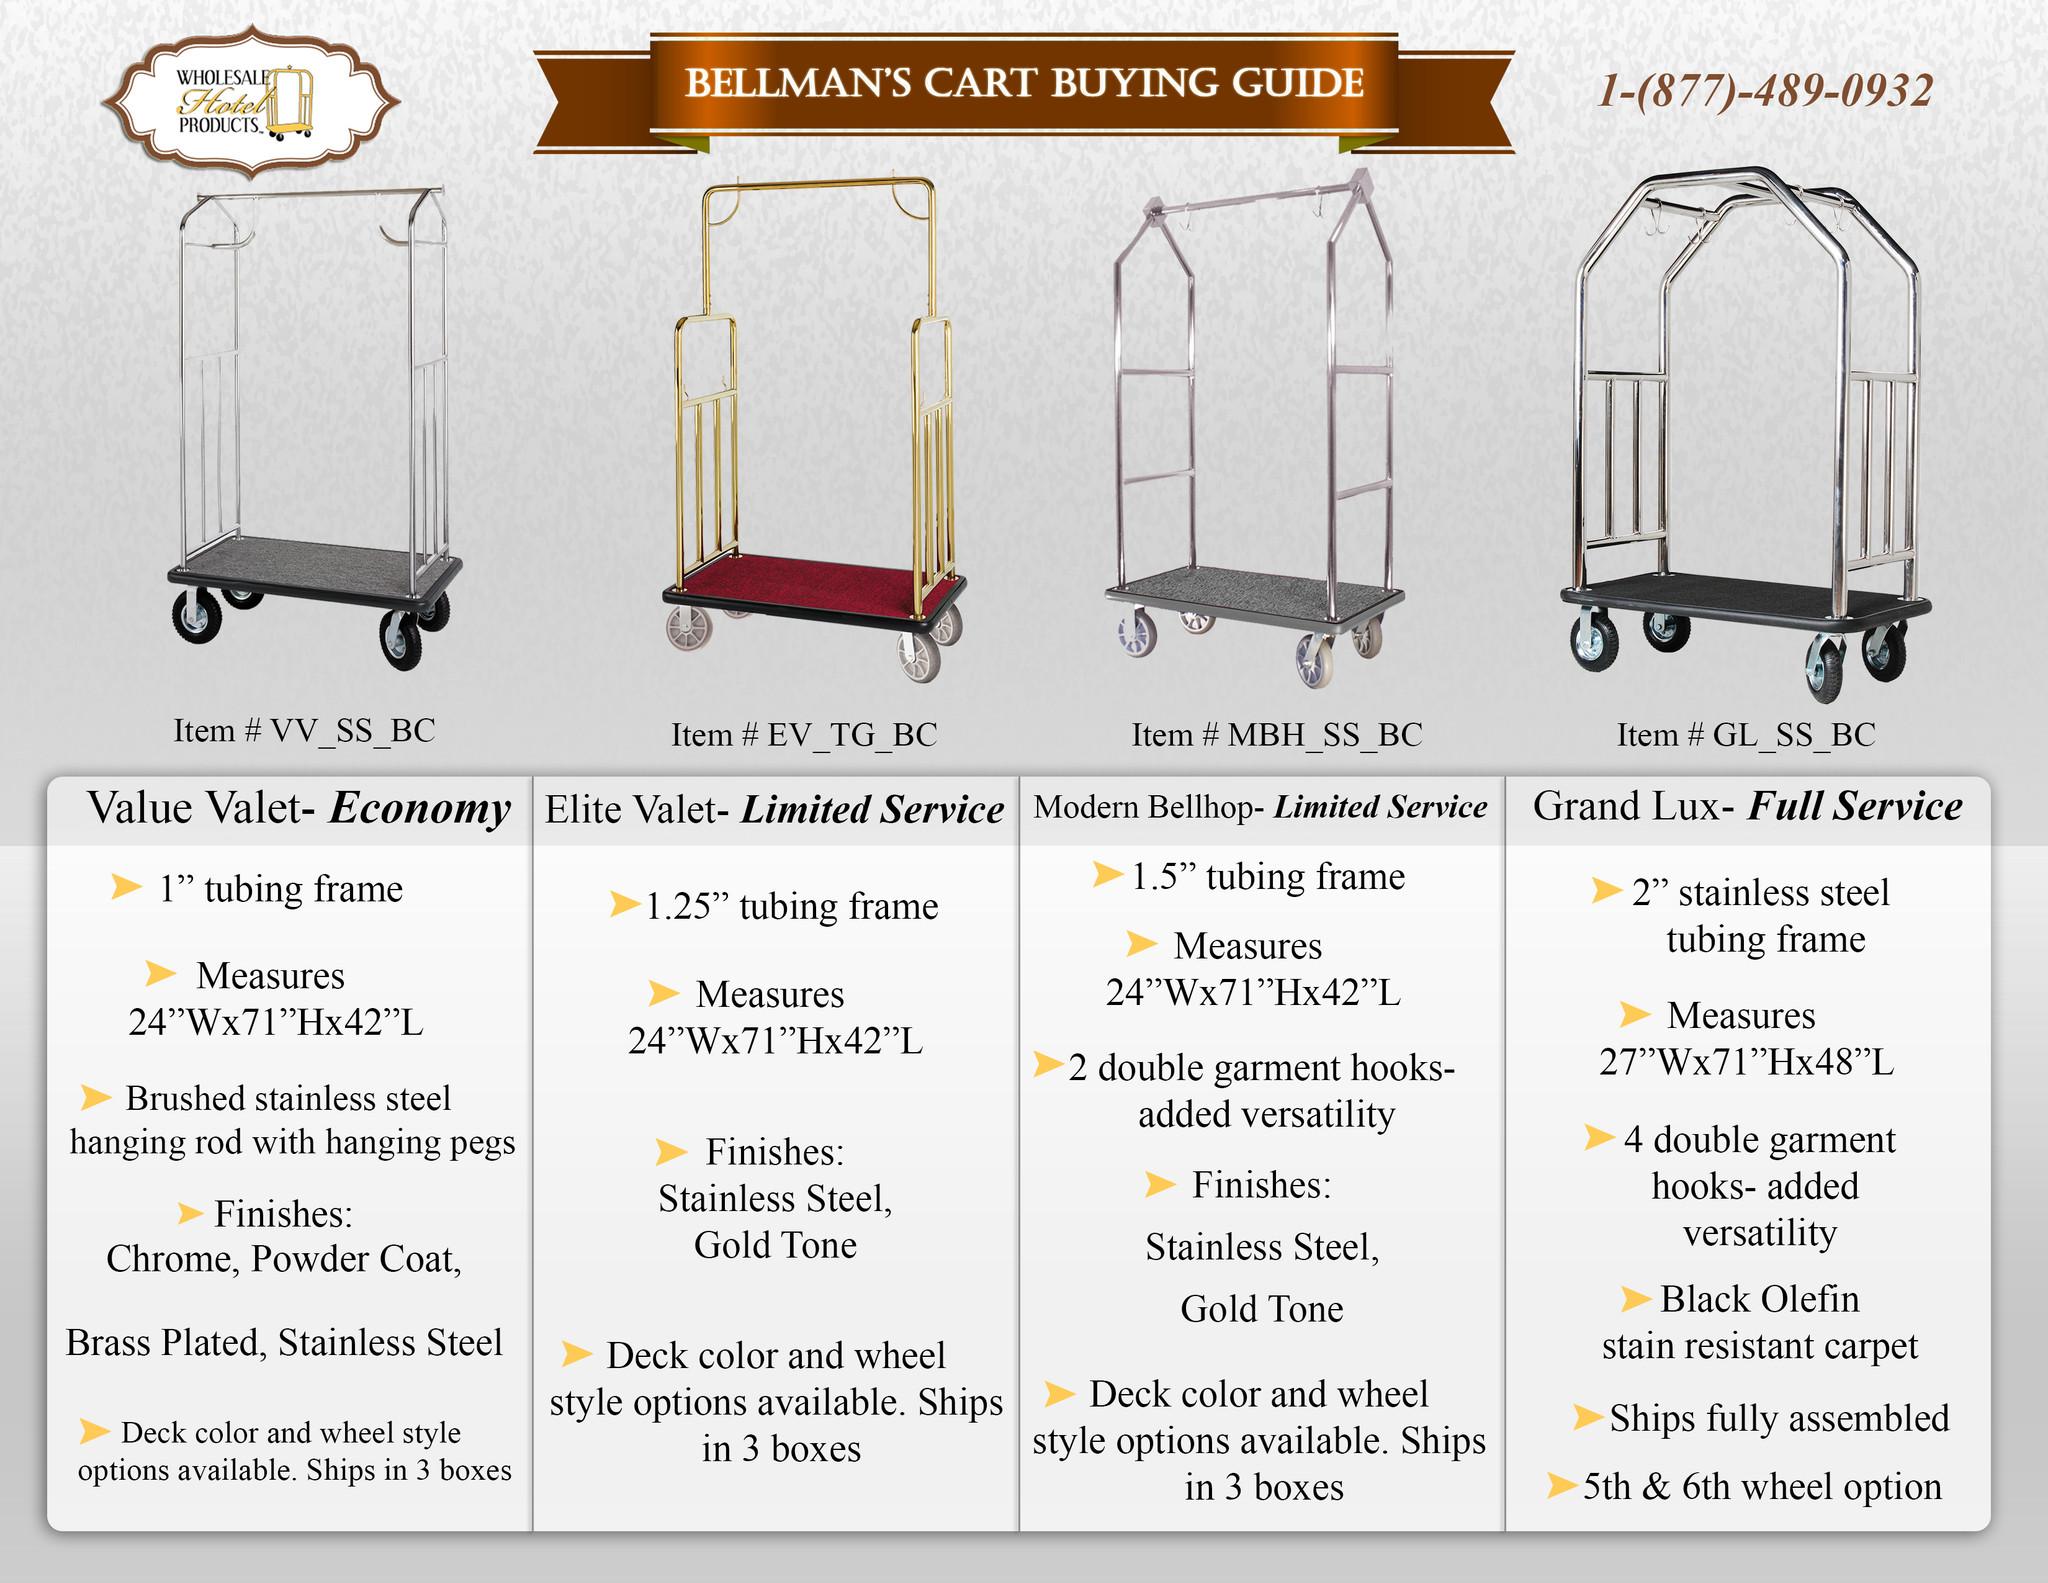 Bellman's Cart Buying Guide